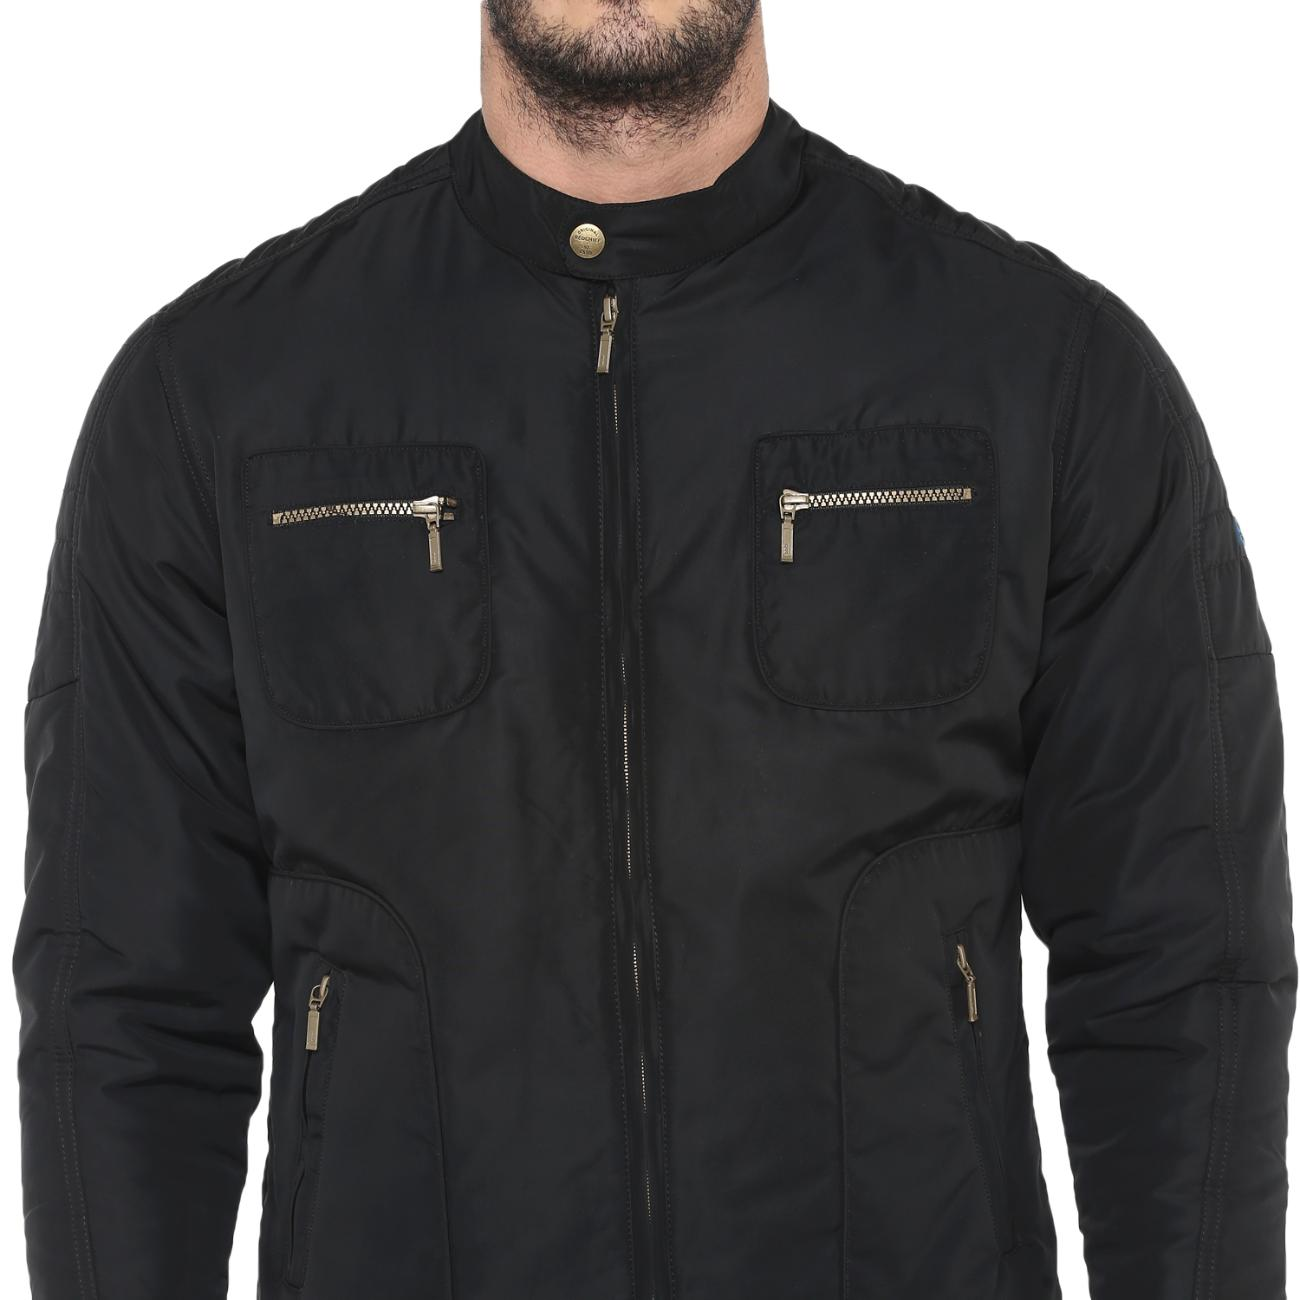 Buy Black Jacket at Red Chief